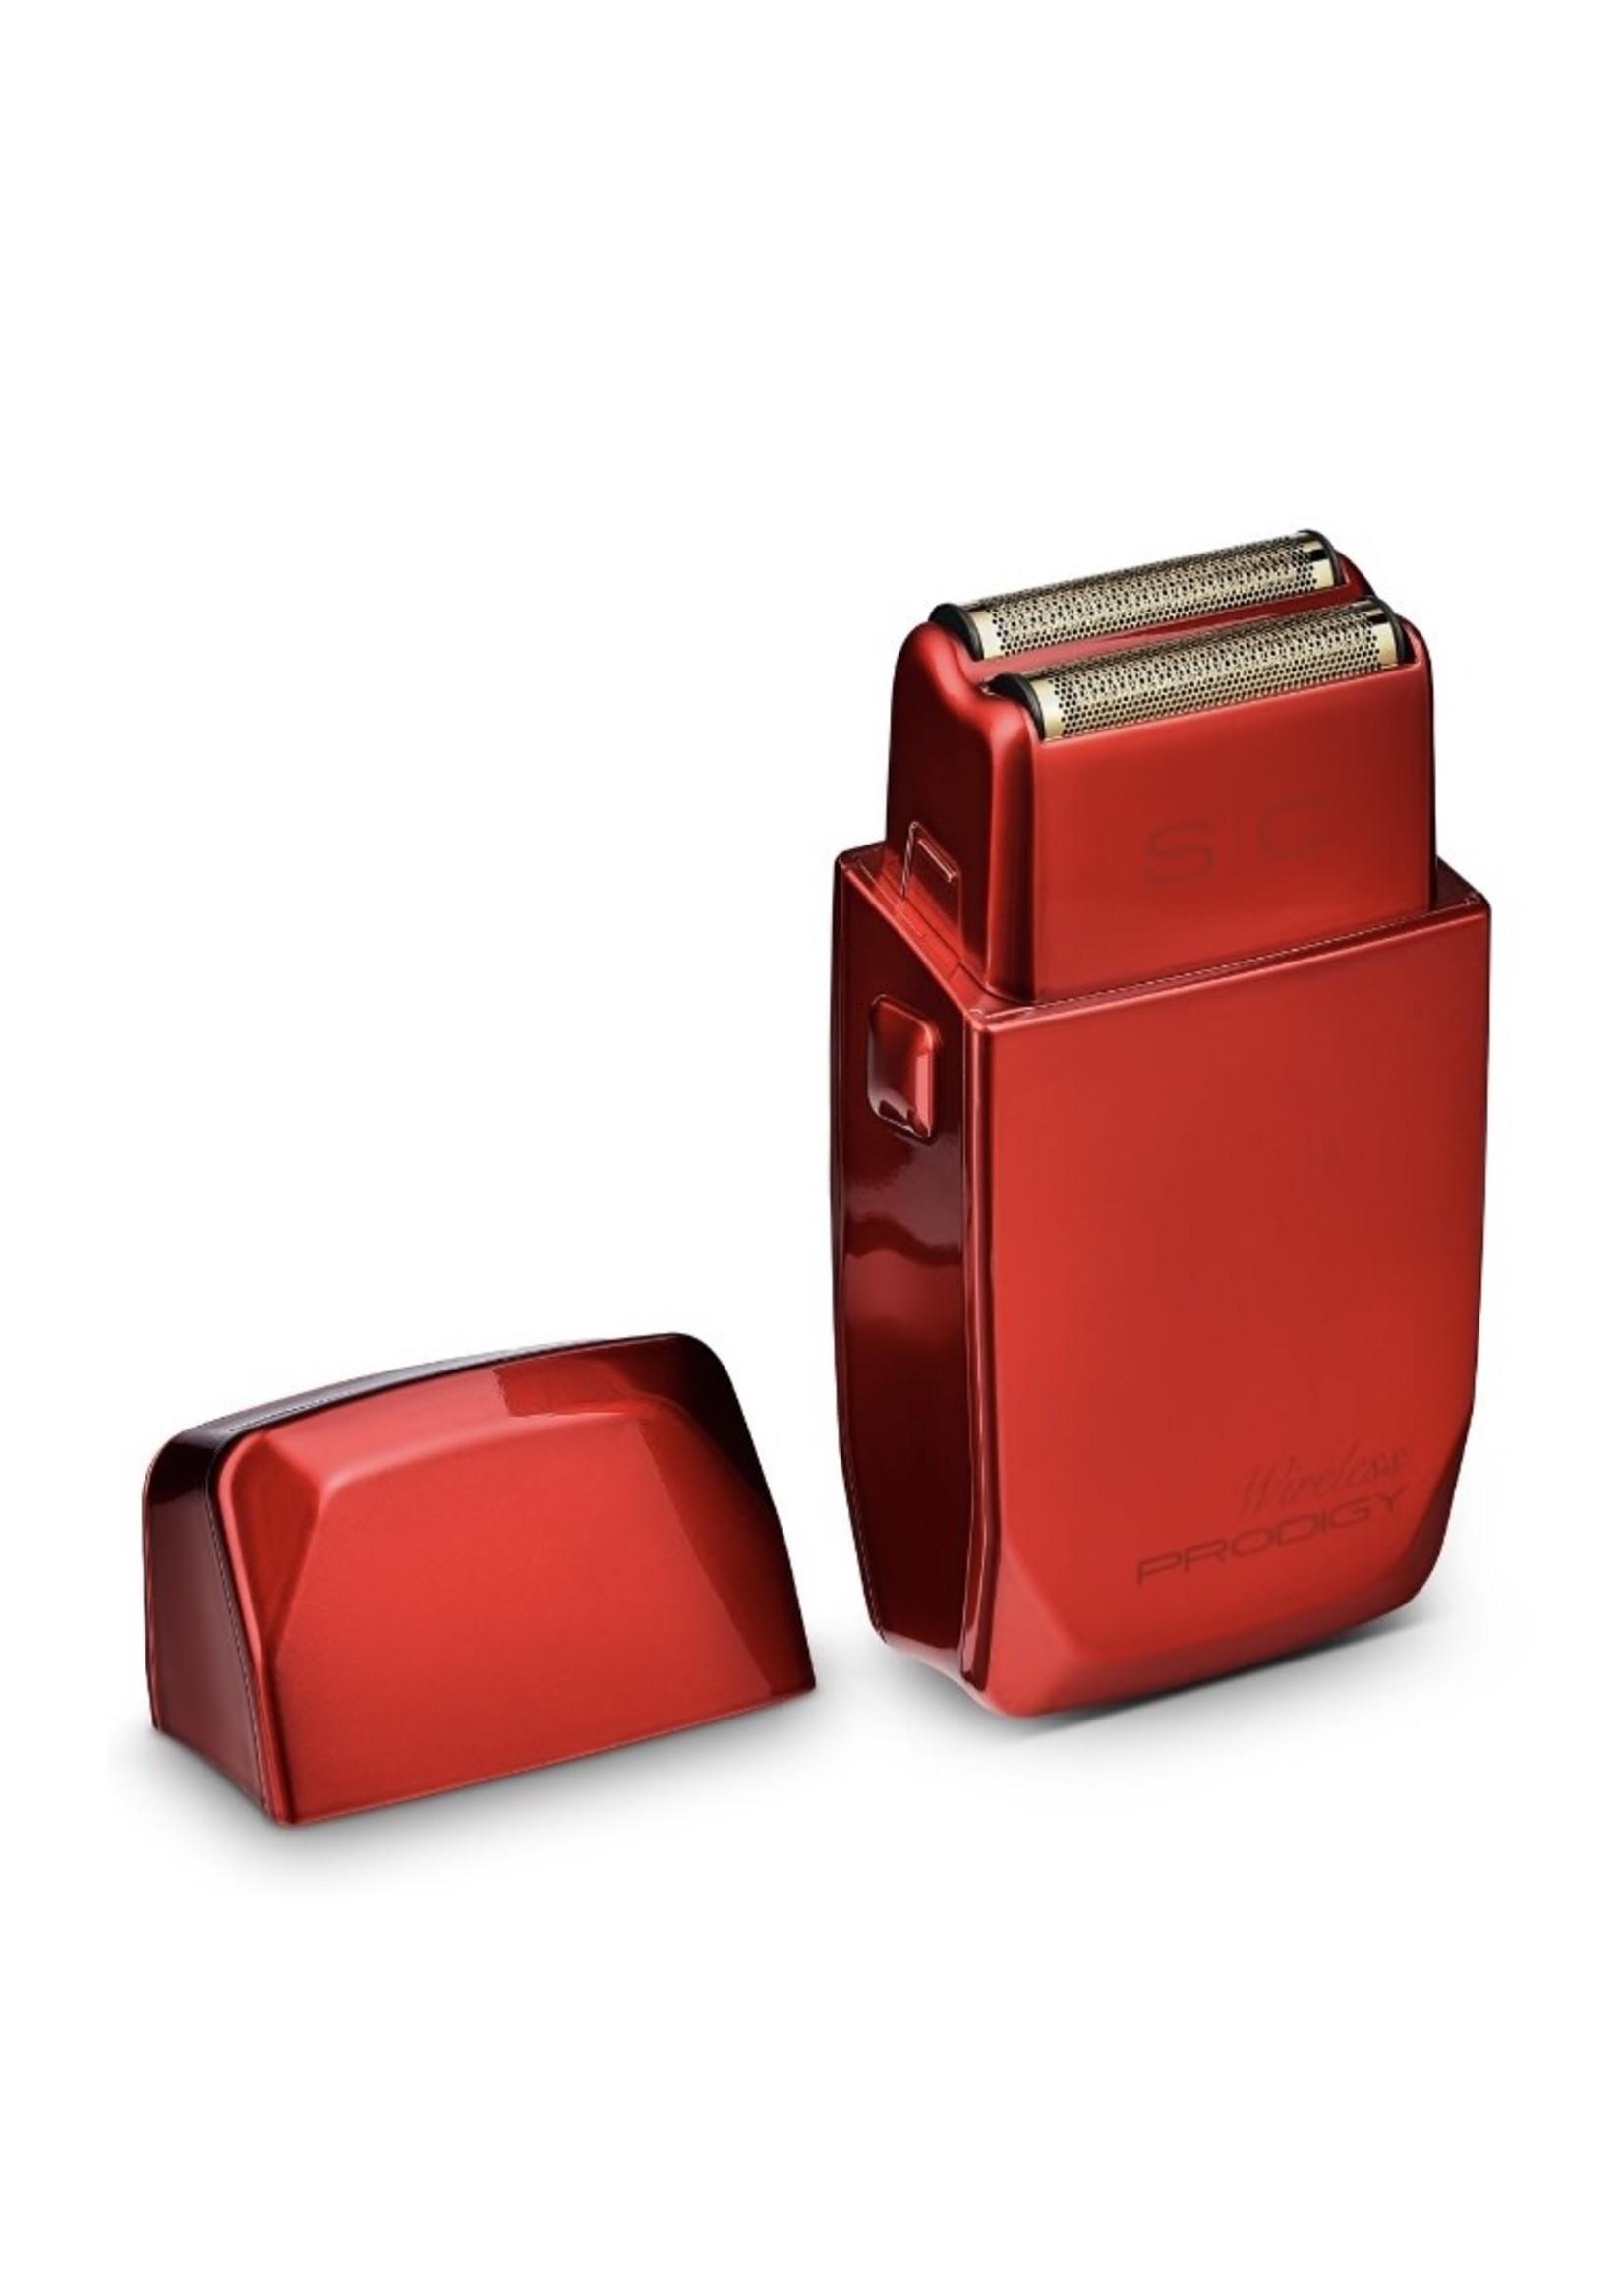 Stylecraft StyleCraft Prodigy Foil Shaver - Red